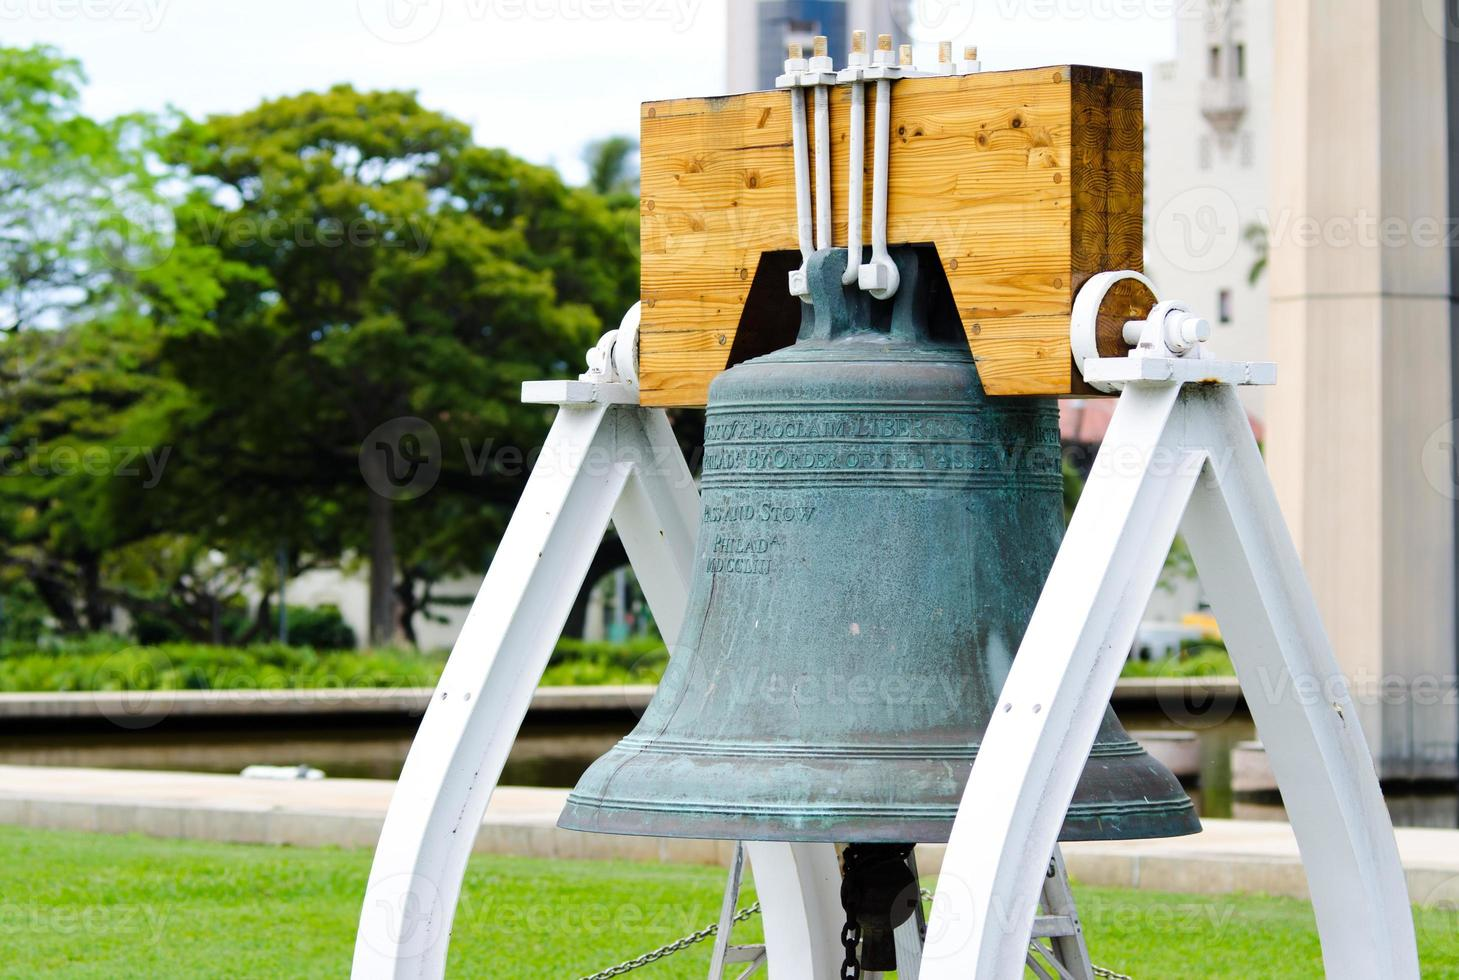 frihetsklocka-replik vid hawaiis statliga huvudstadsbyggnad i honolulu foto